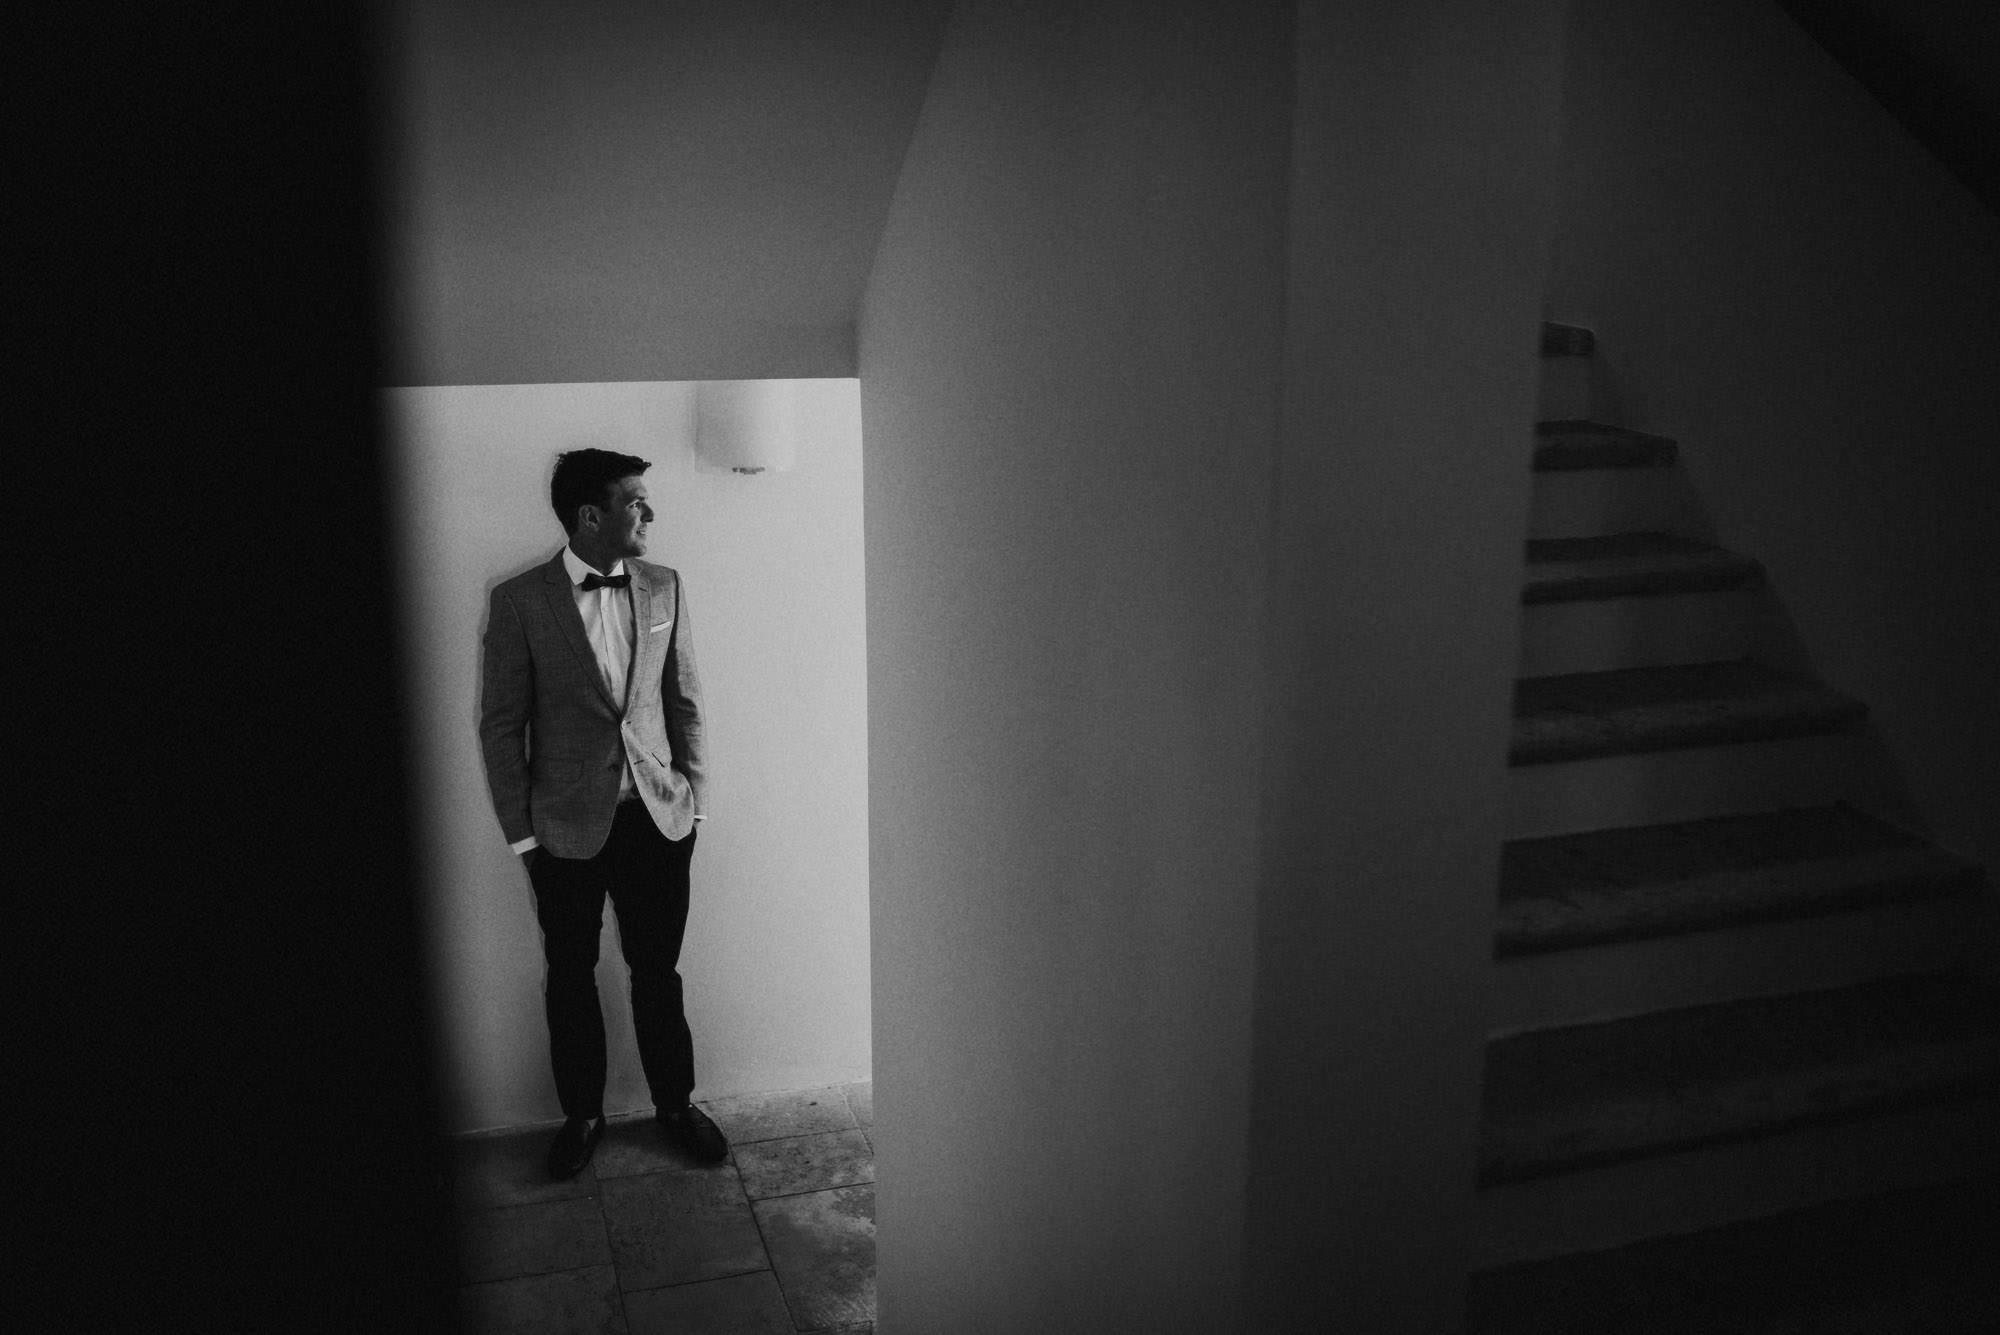 dubrovnik_croatia_wedding_photographer-jere_satamo-destination_weddings-023-web.jpg